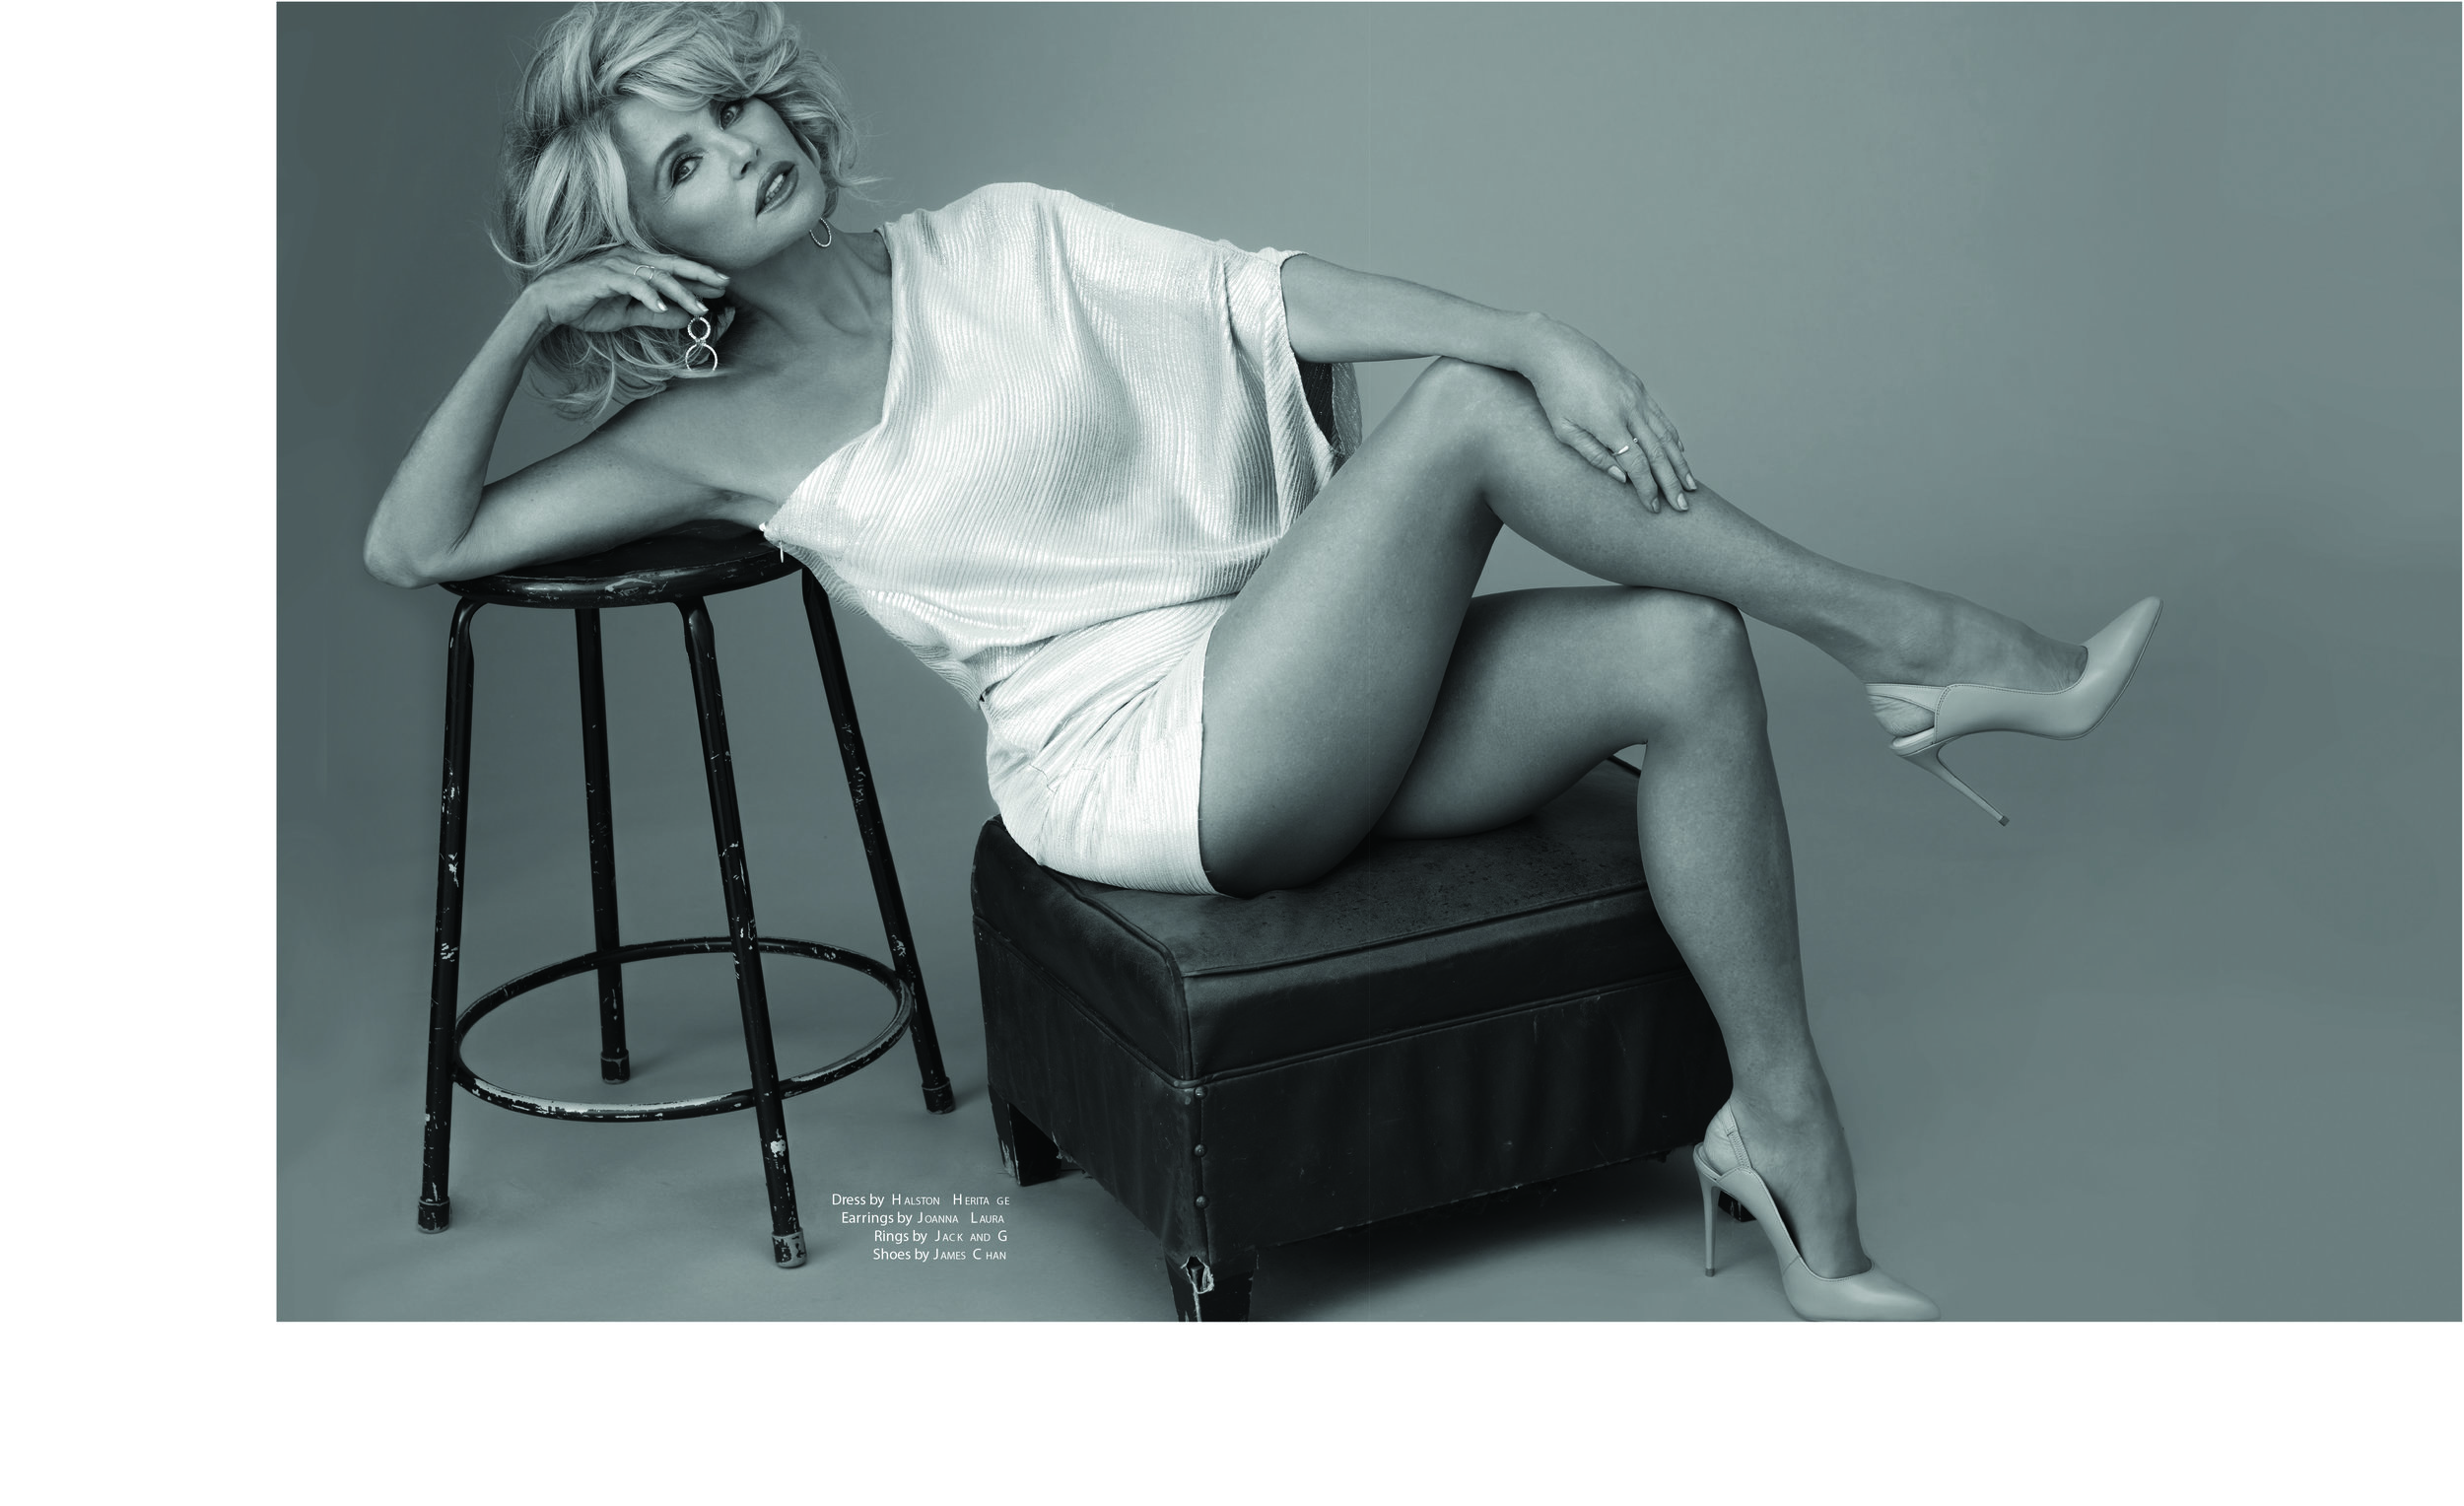 Christie Brinkley Centerfold.jpg